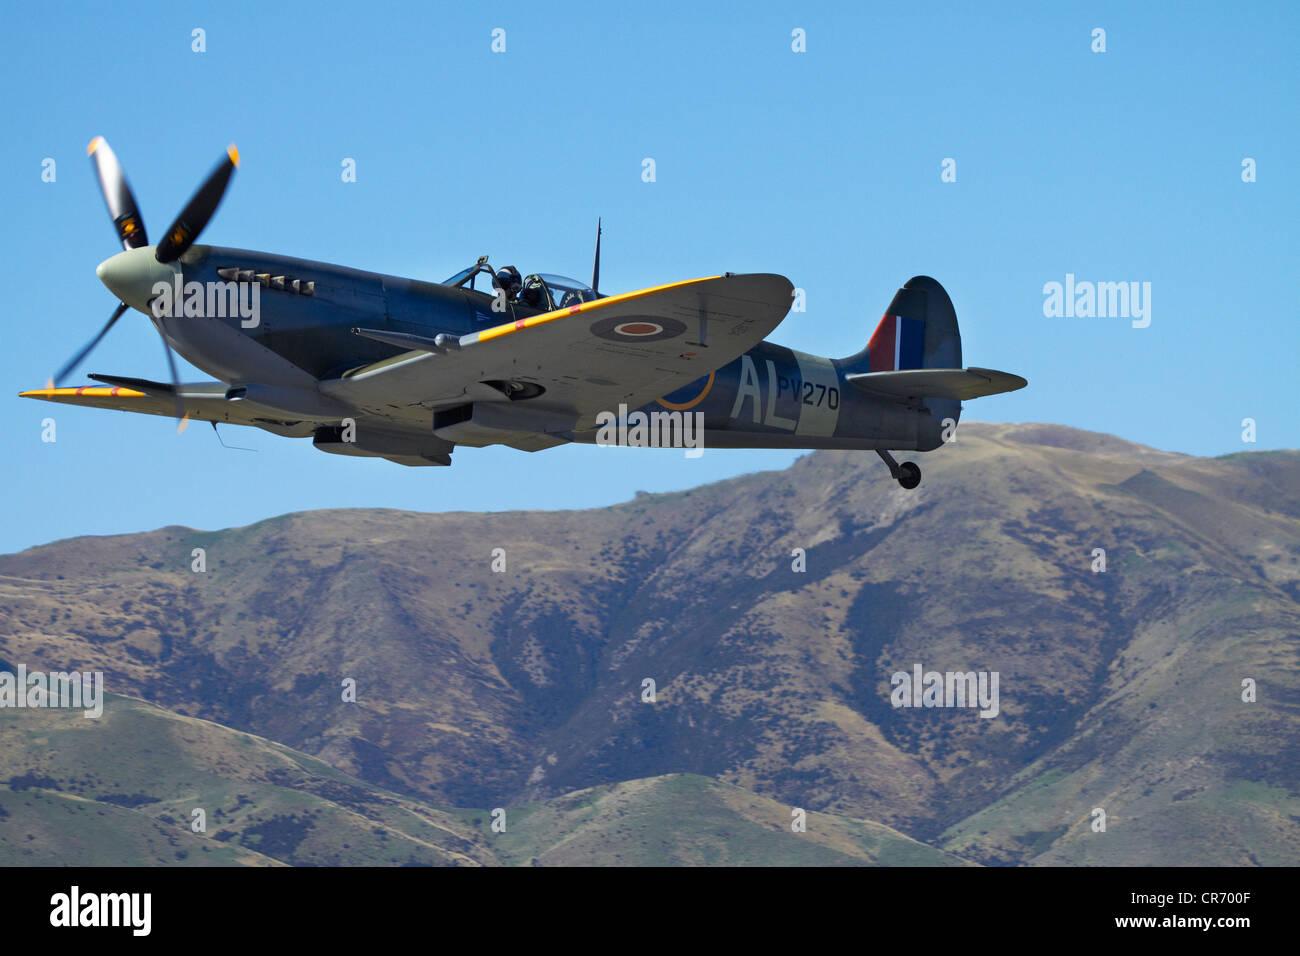 Supermarine Spitfire - British and allied WWII Fighter Plane, Wanaka, South Island, New Zealand - Stock Image